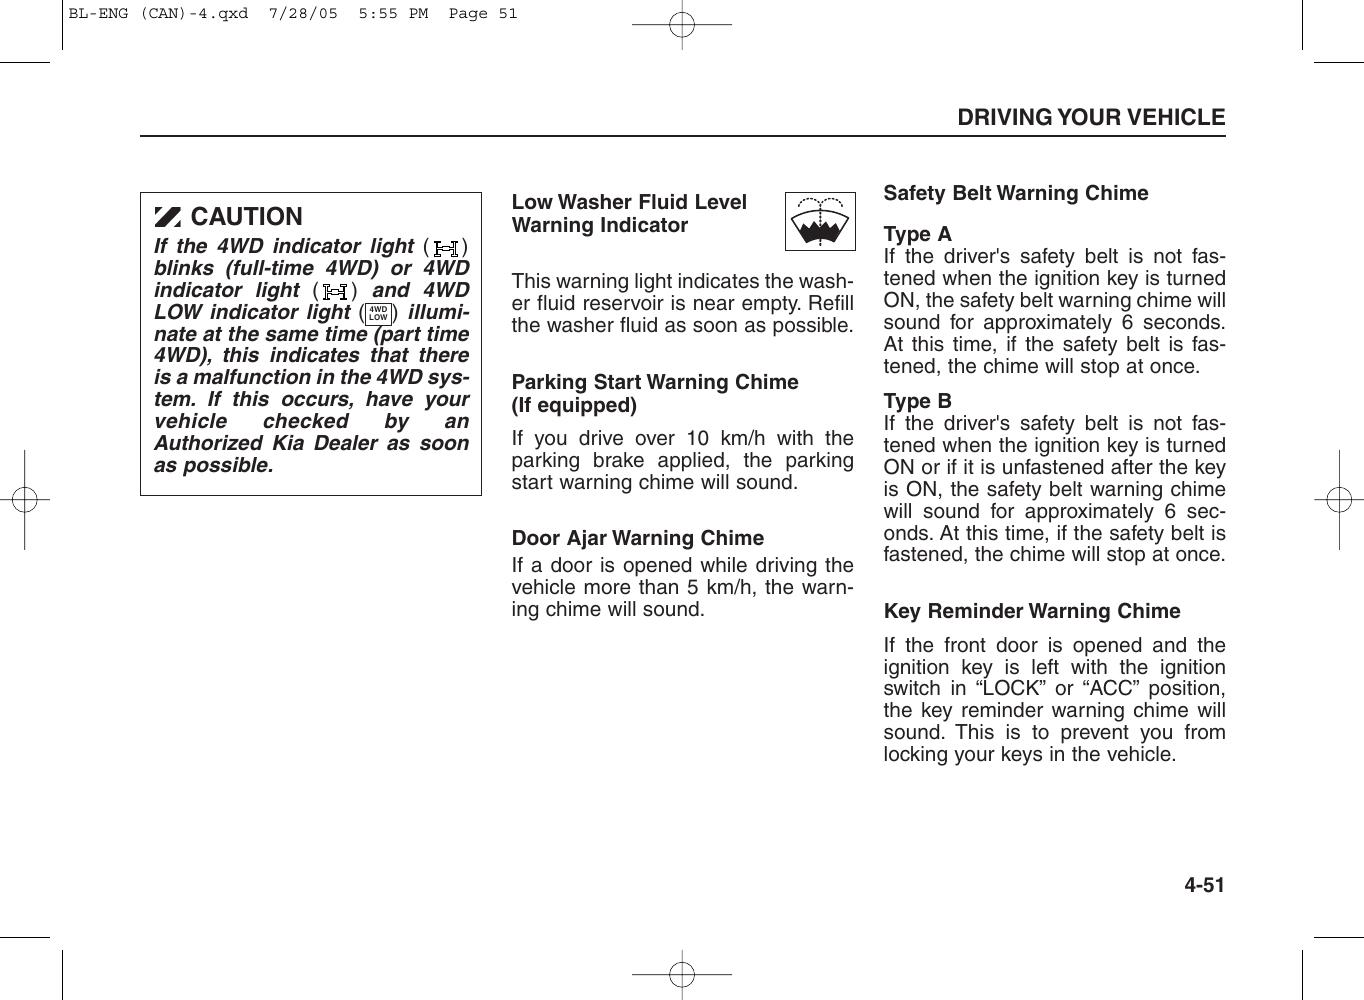 Kia 2006 Sorento Owners Manual EN